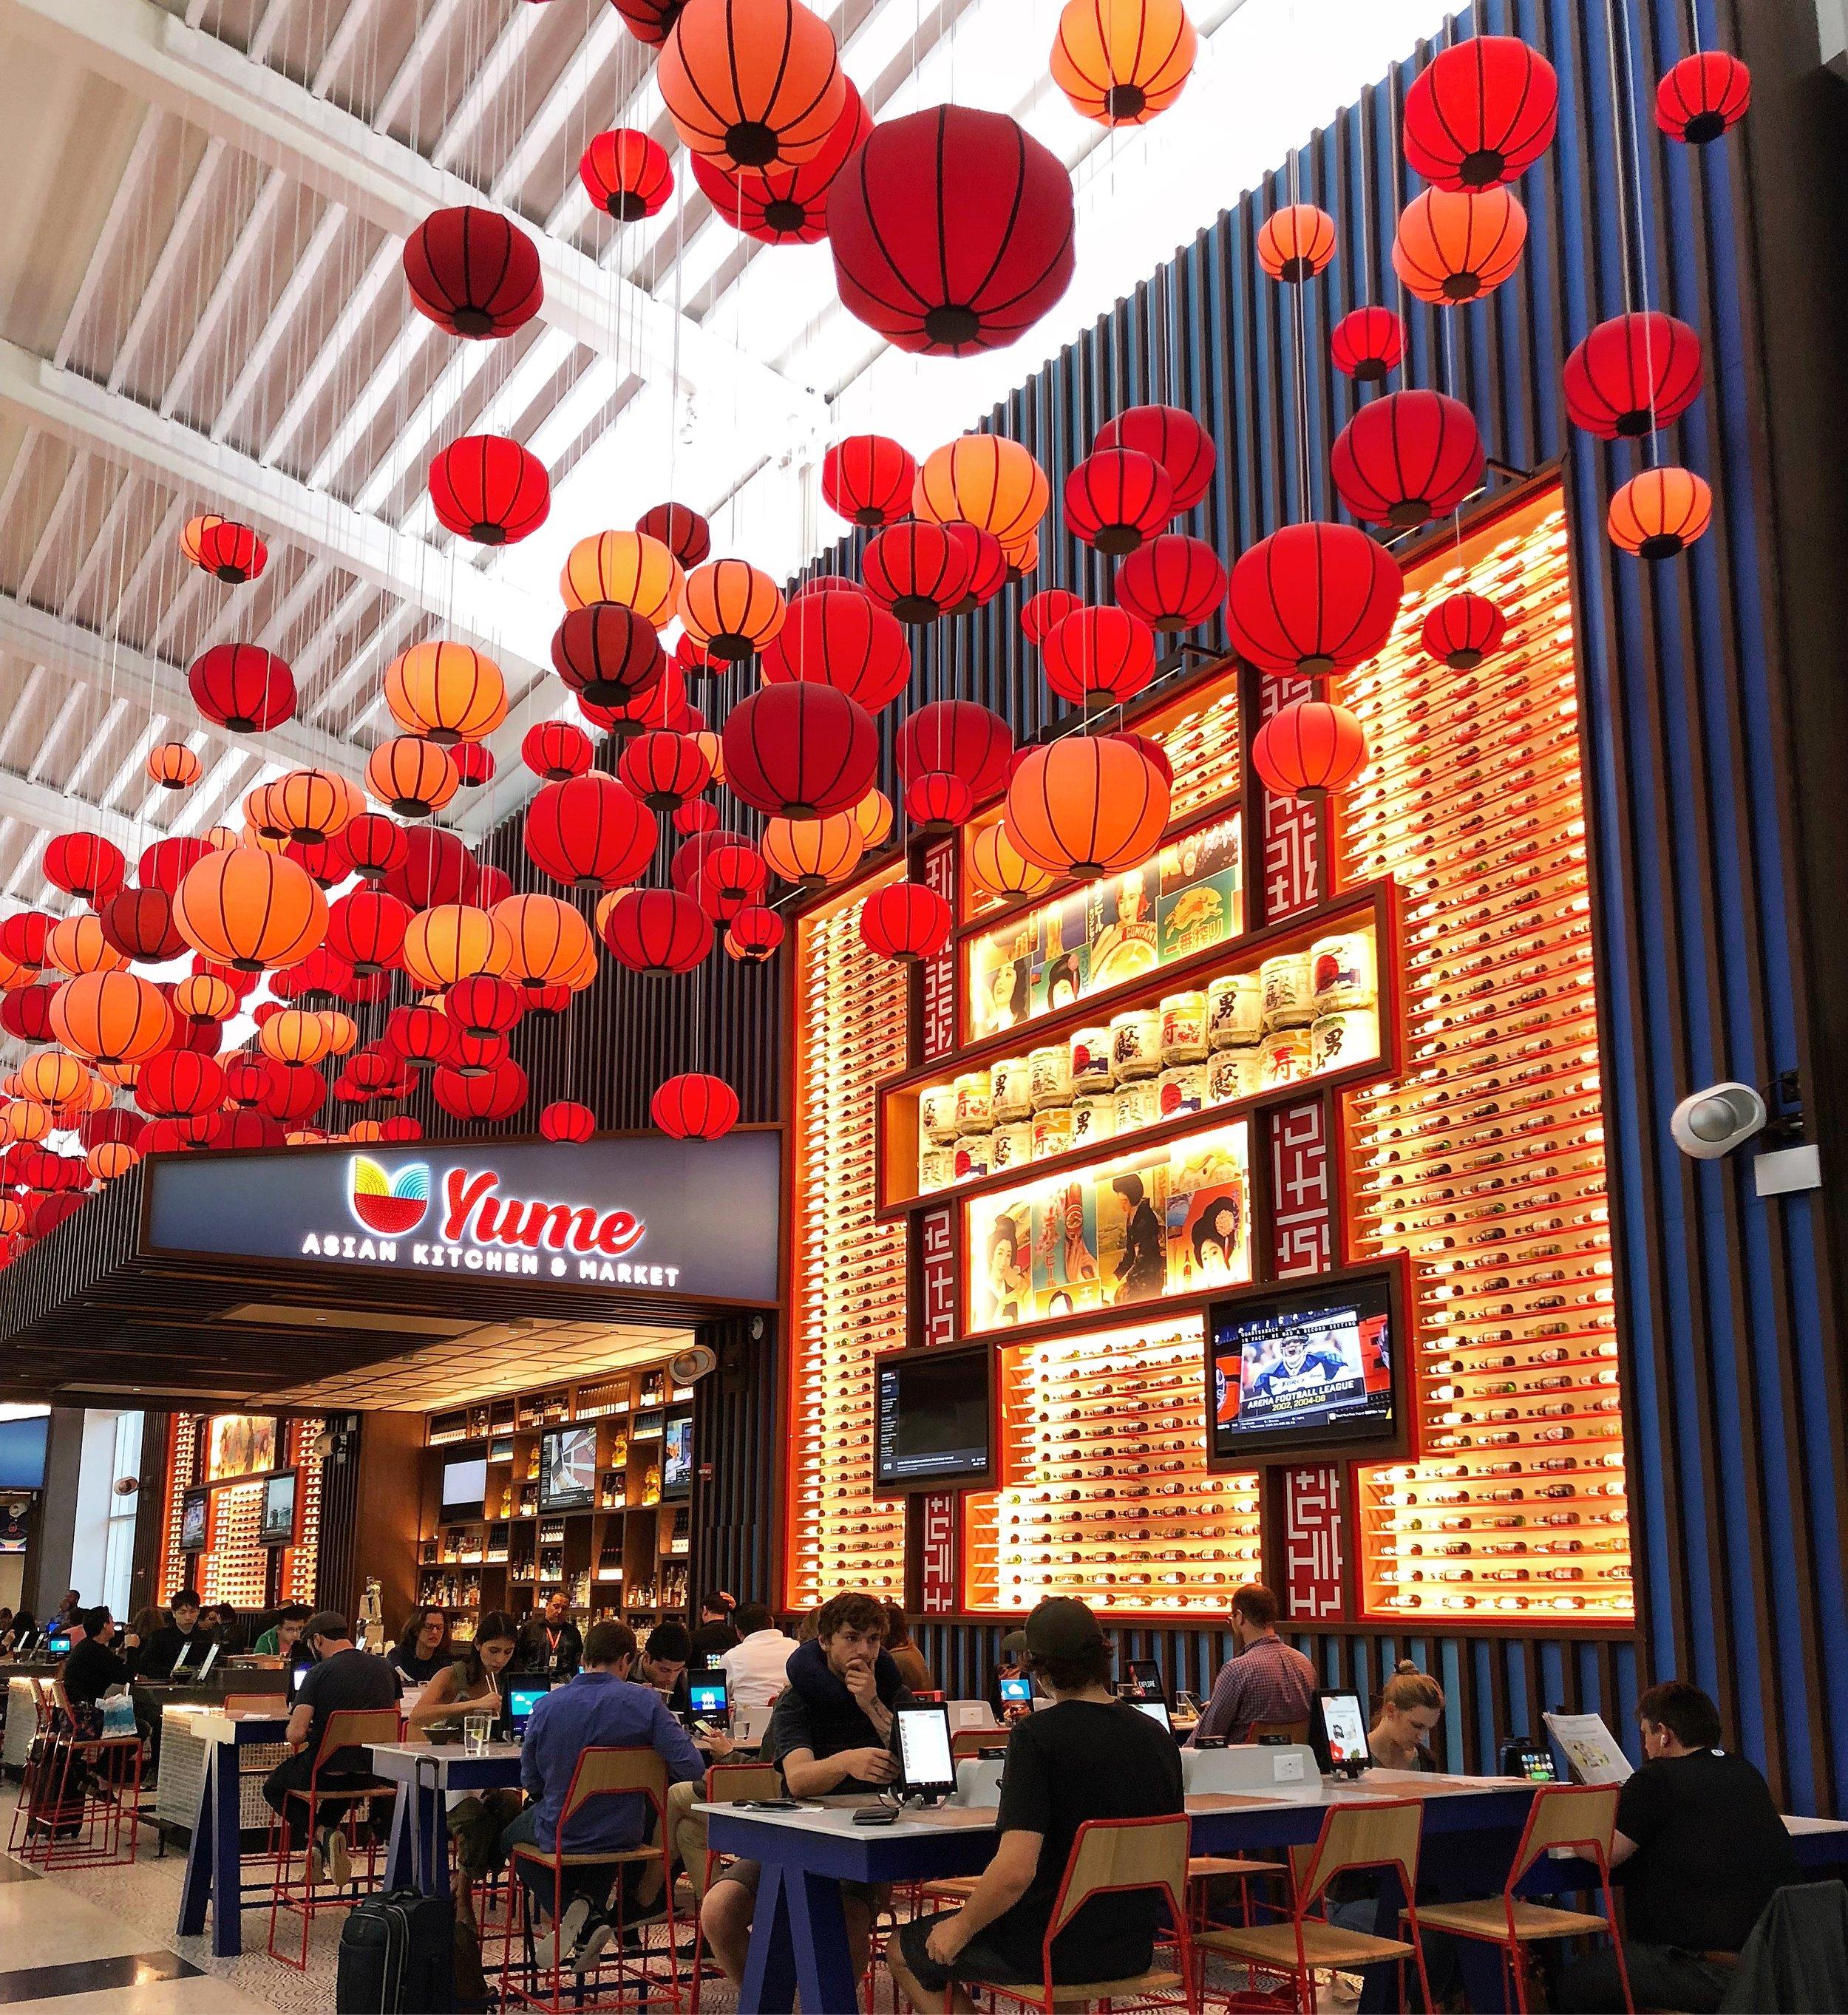 Restaurant yume at terminal e IAH photo by yomarianablog